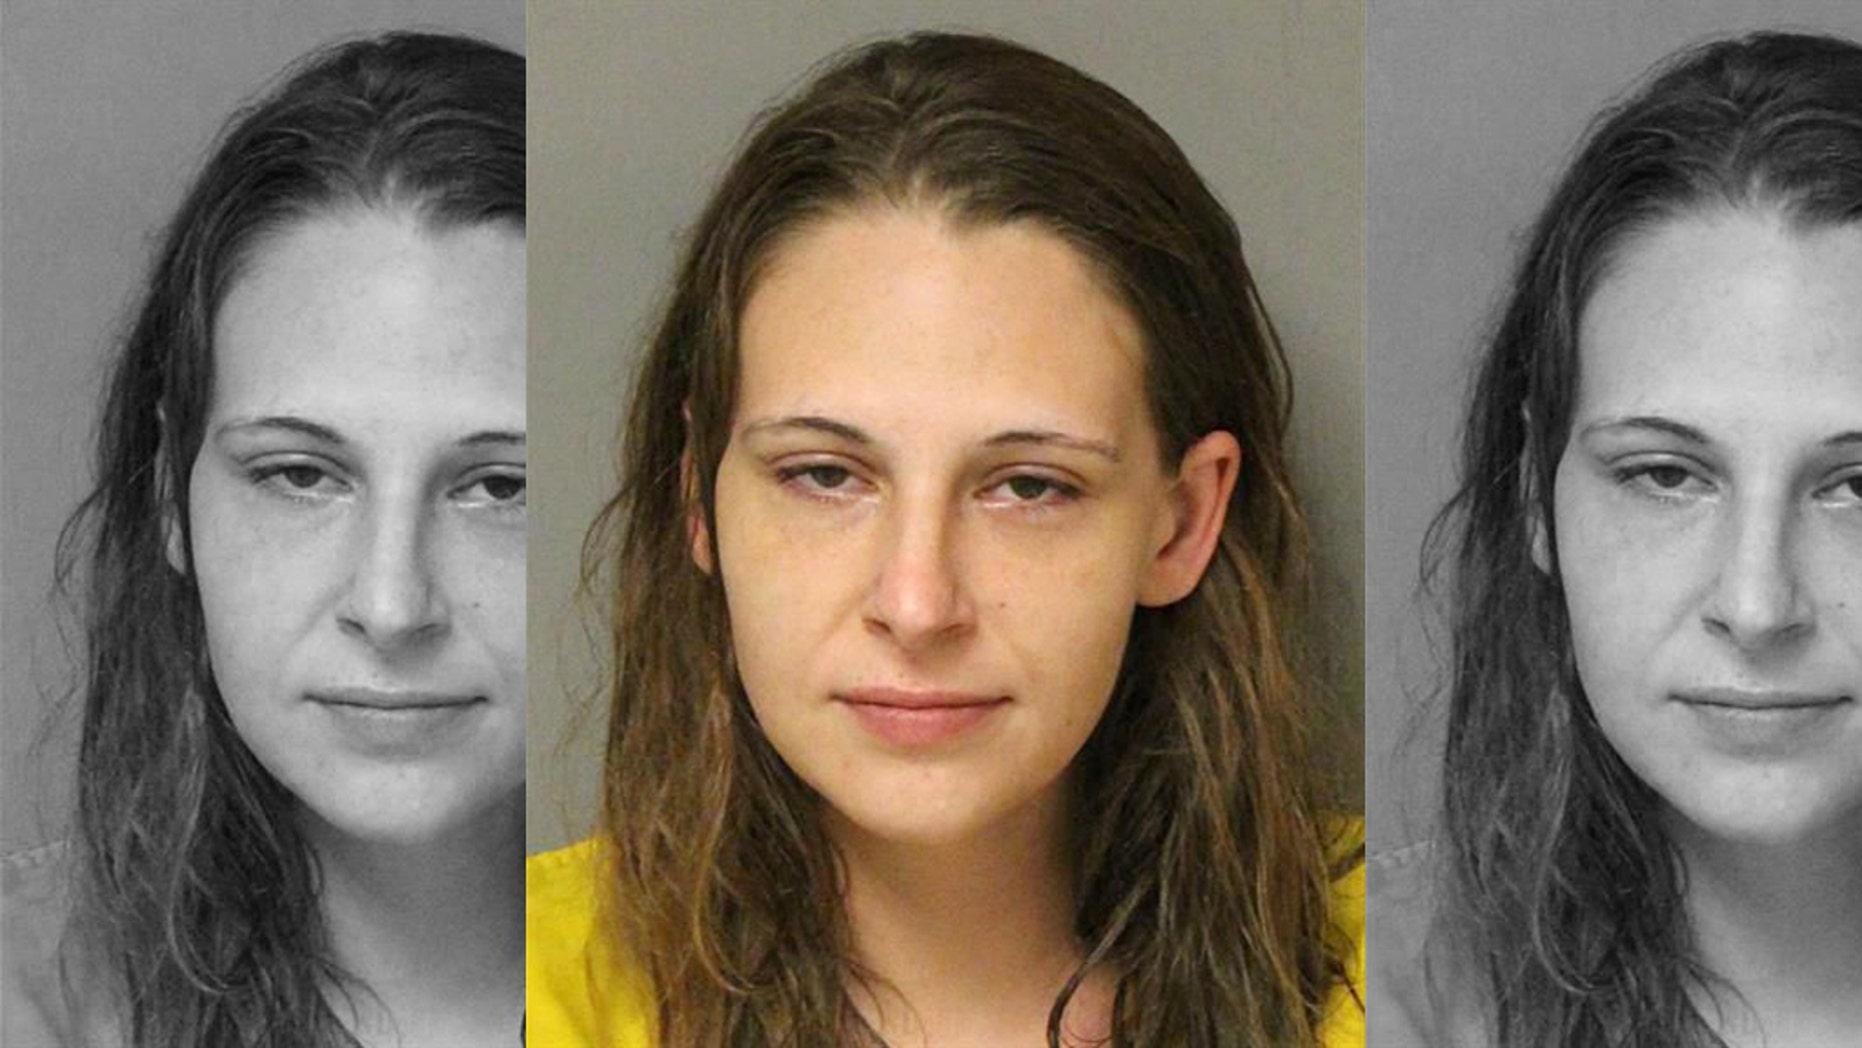 Virginia woman allegedly gives boy, 10, detox drug so she